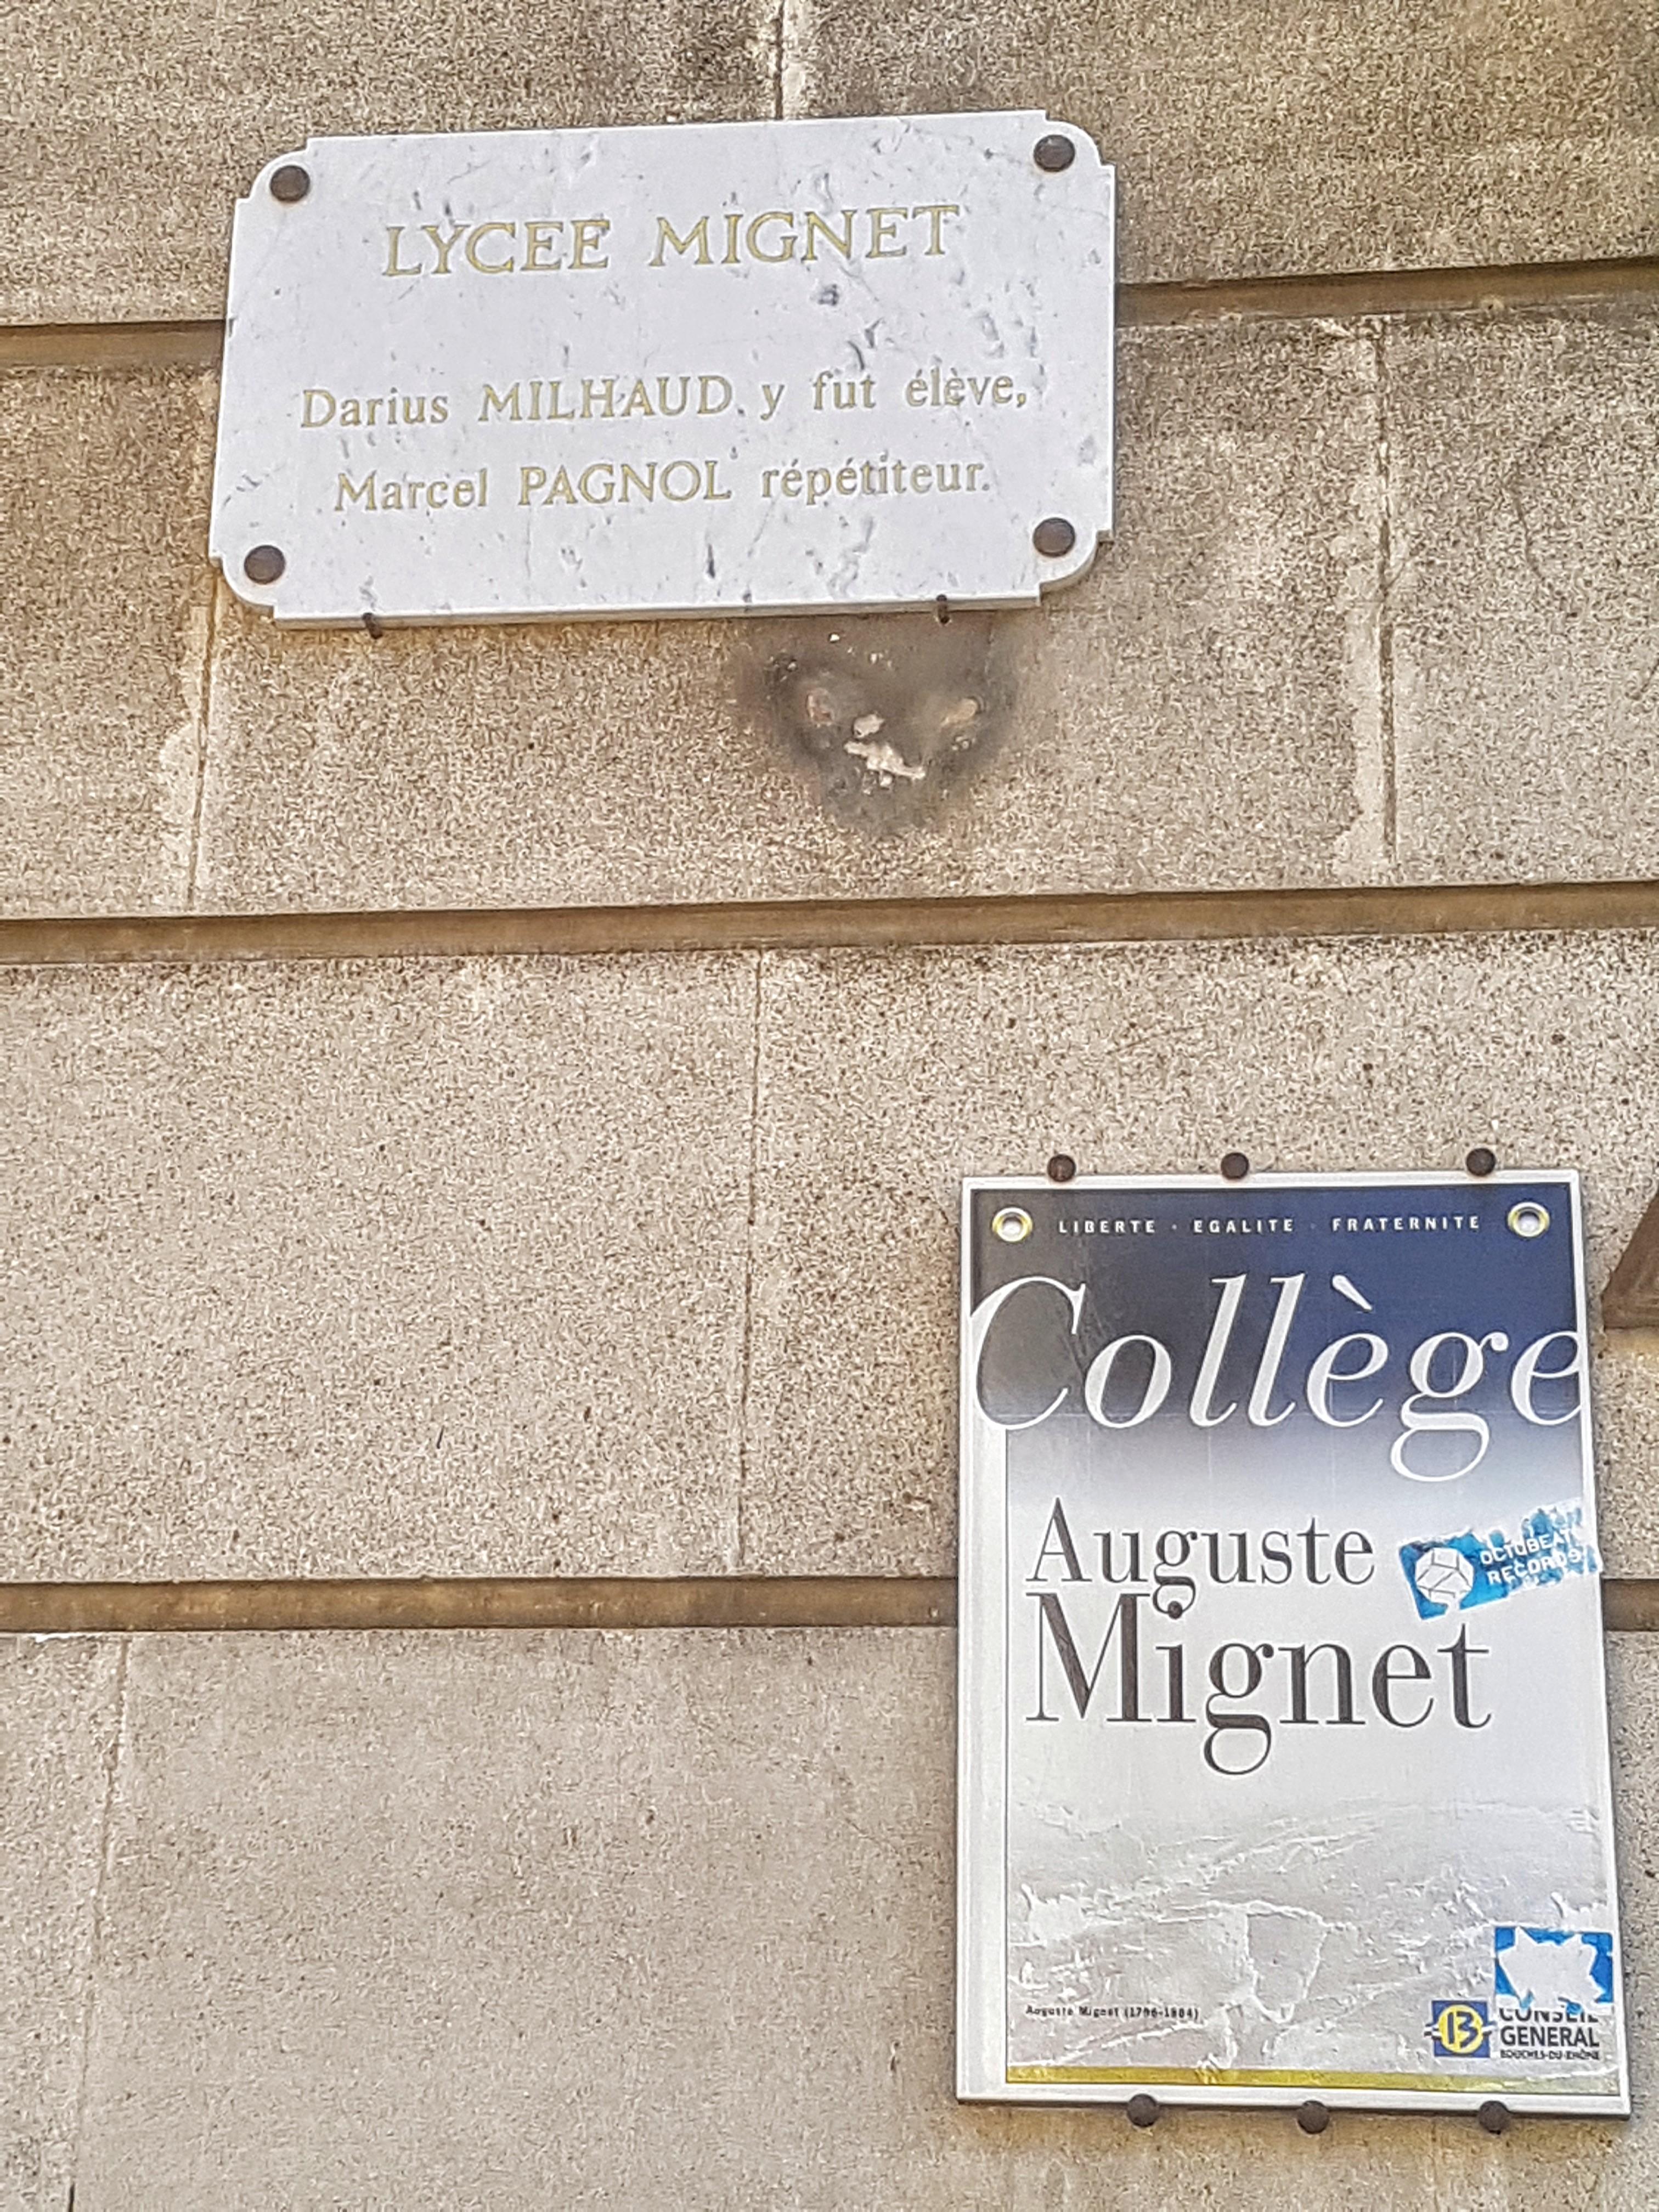 LycéeMignet.jpg